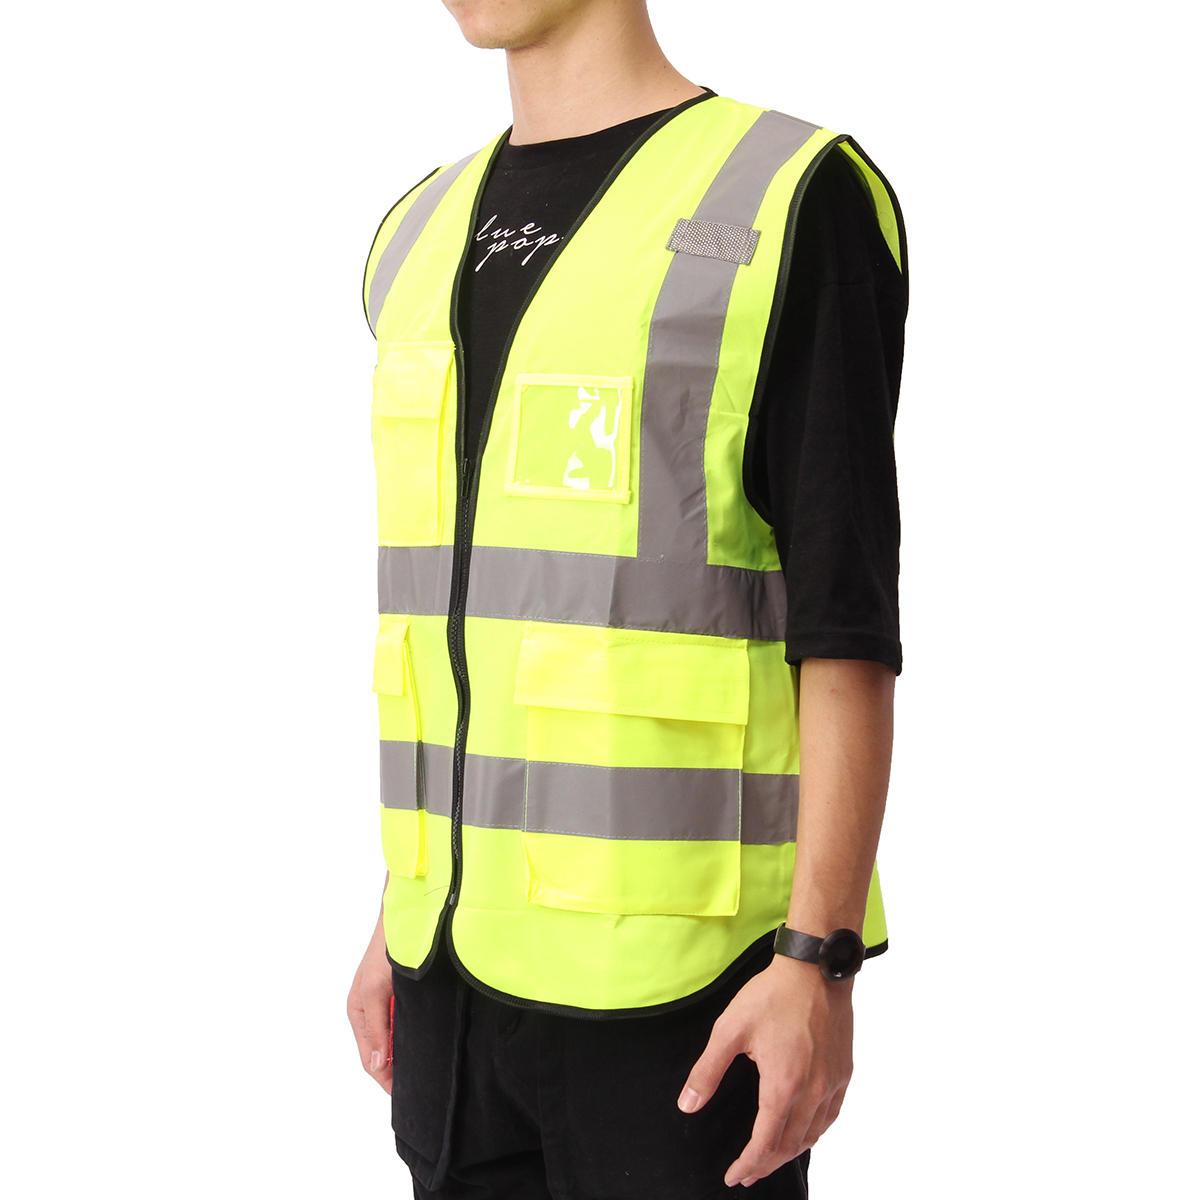 5 Color Vis Vest Workwear Clothing Safety Reflective Vest Safety Vest Reflective